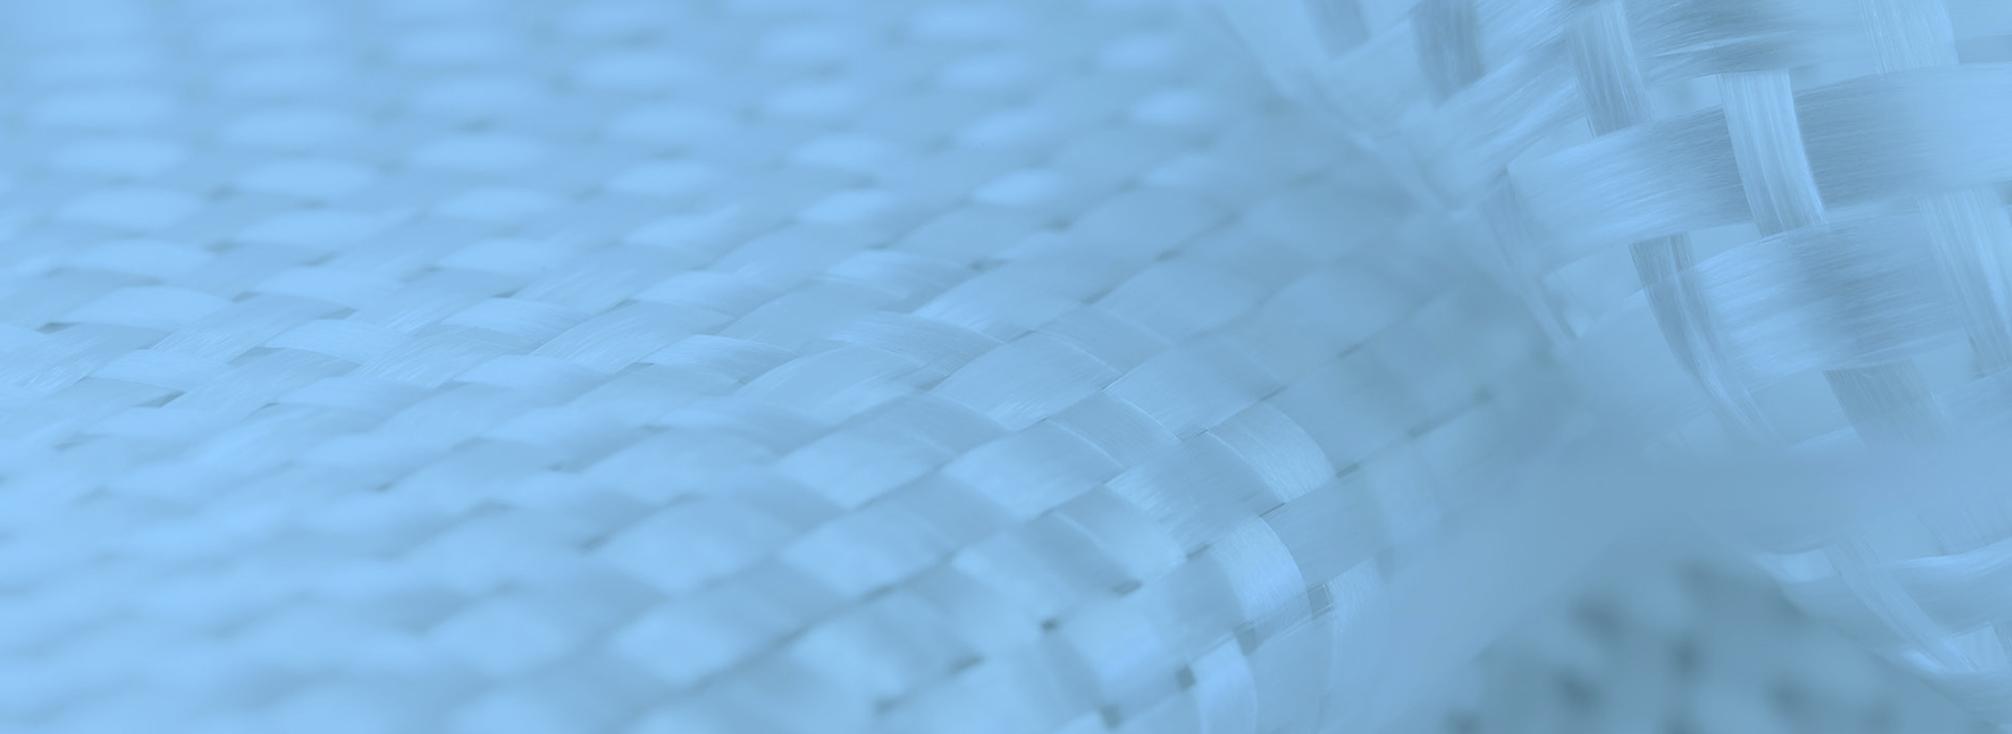 DK Polyester Techniek blauw2